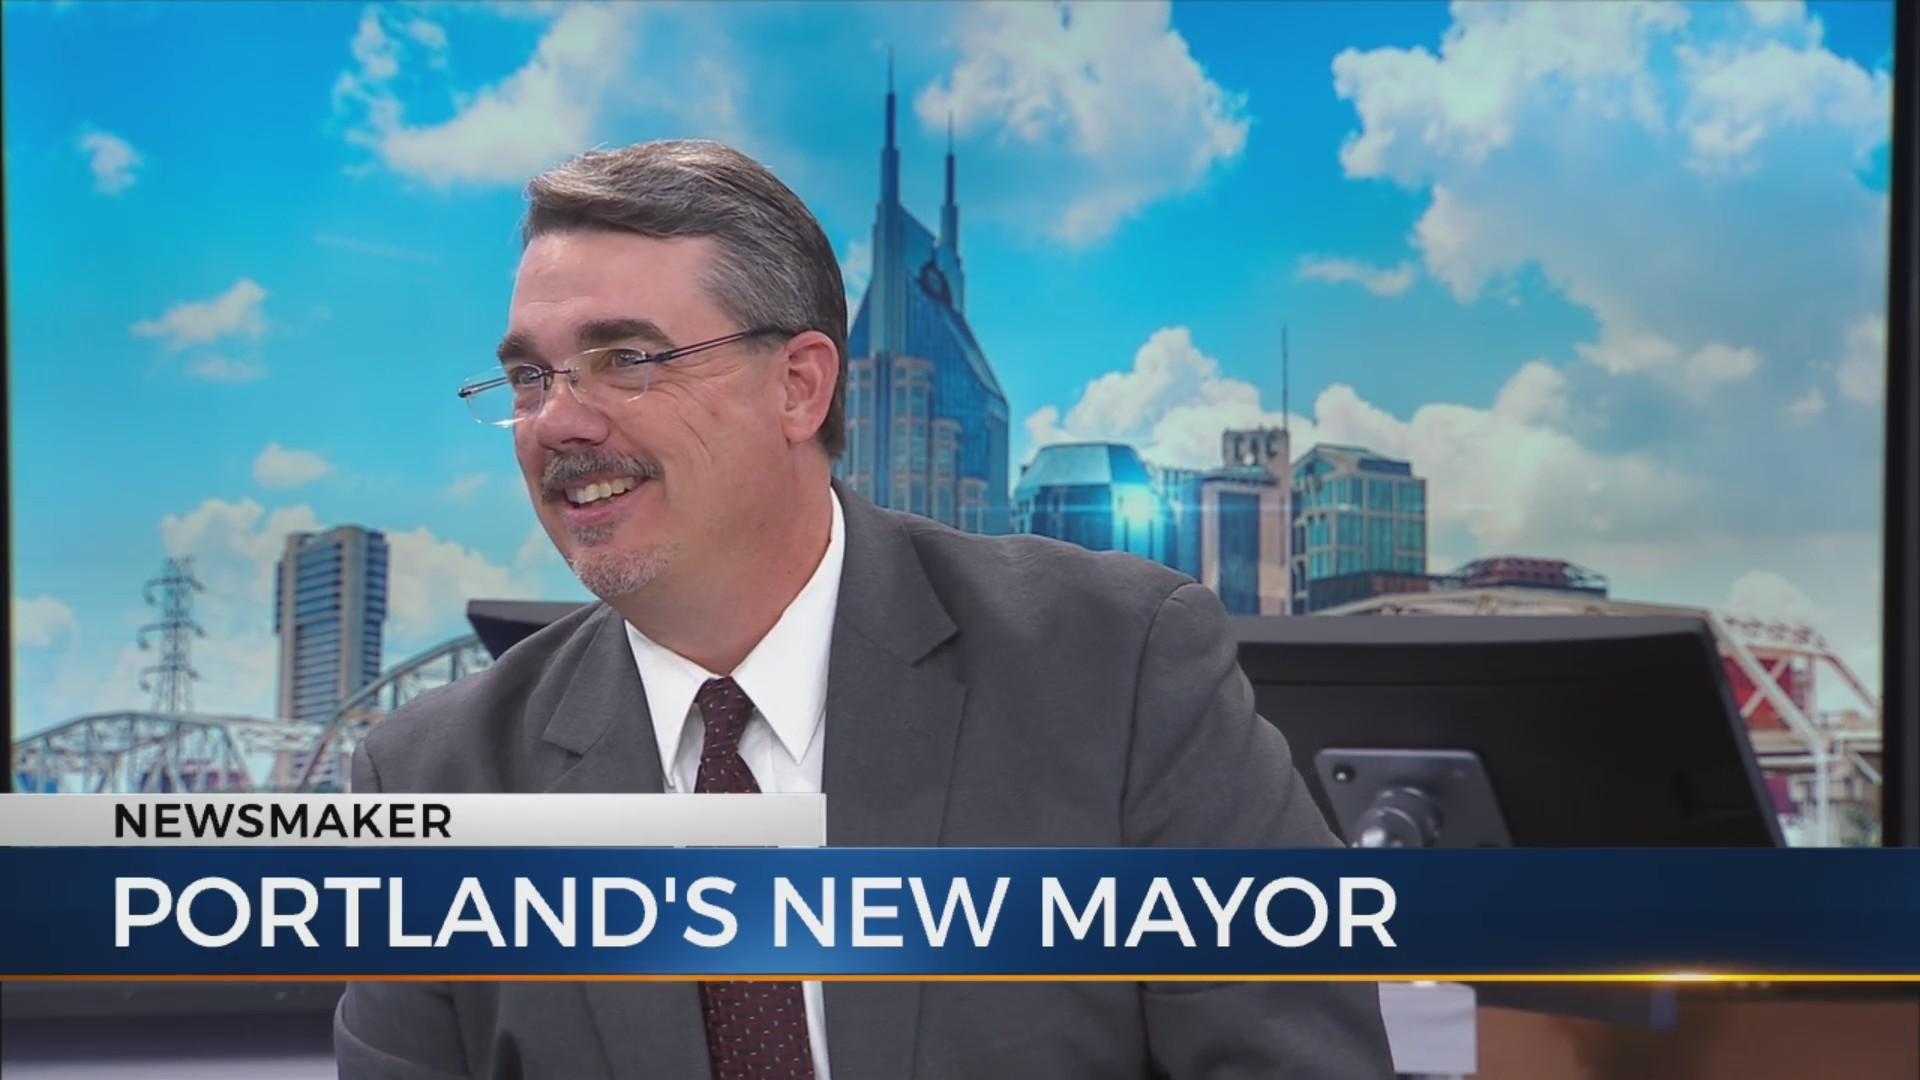 Newsmaker__Portland_s_new_mayor_0_20181115193545